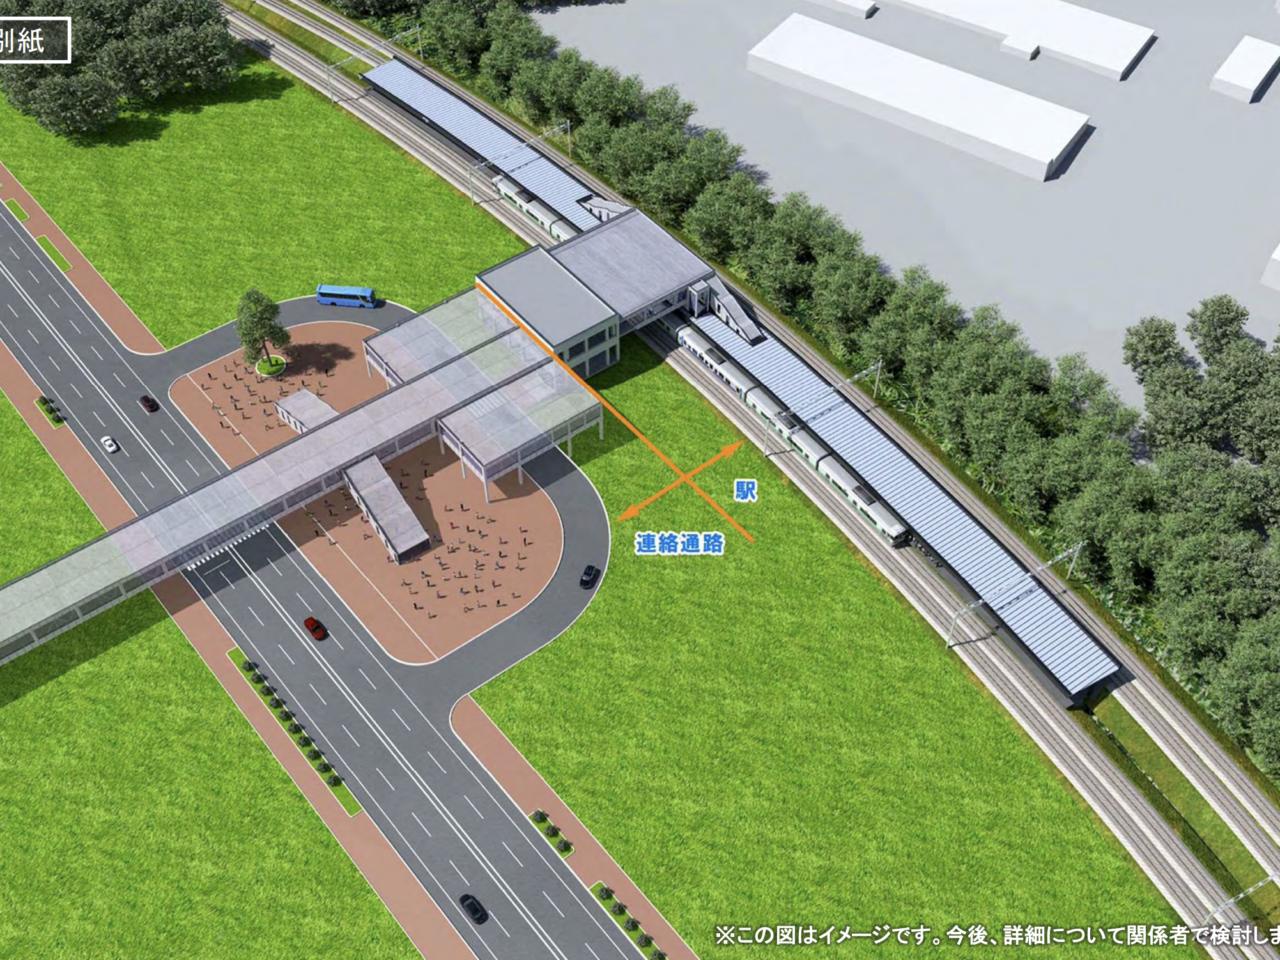 JR北海道の北広島市ボールパーク新駅のイメージパース